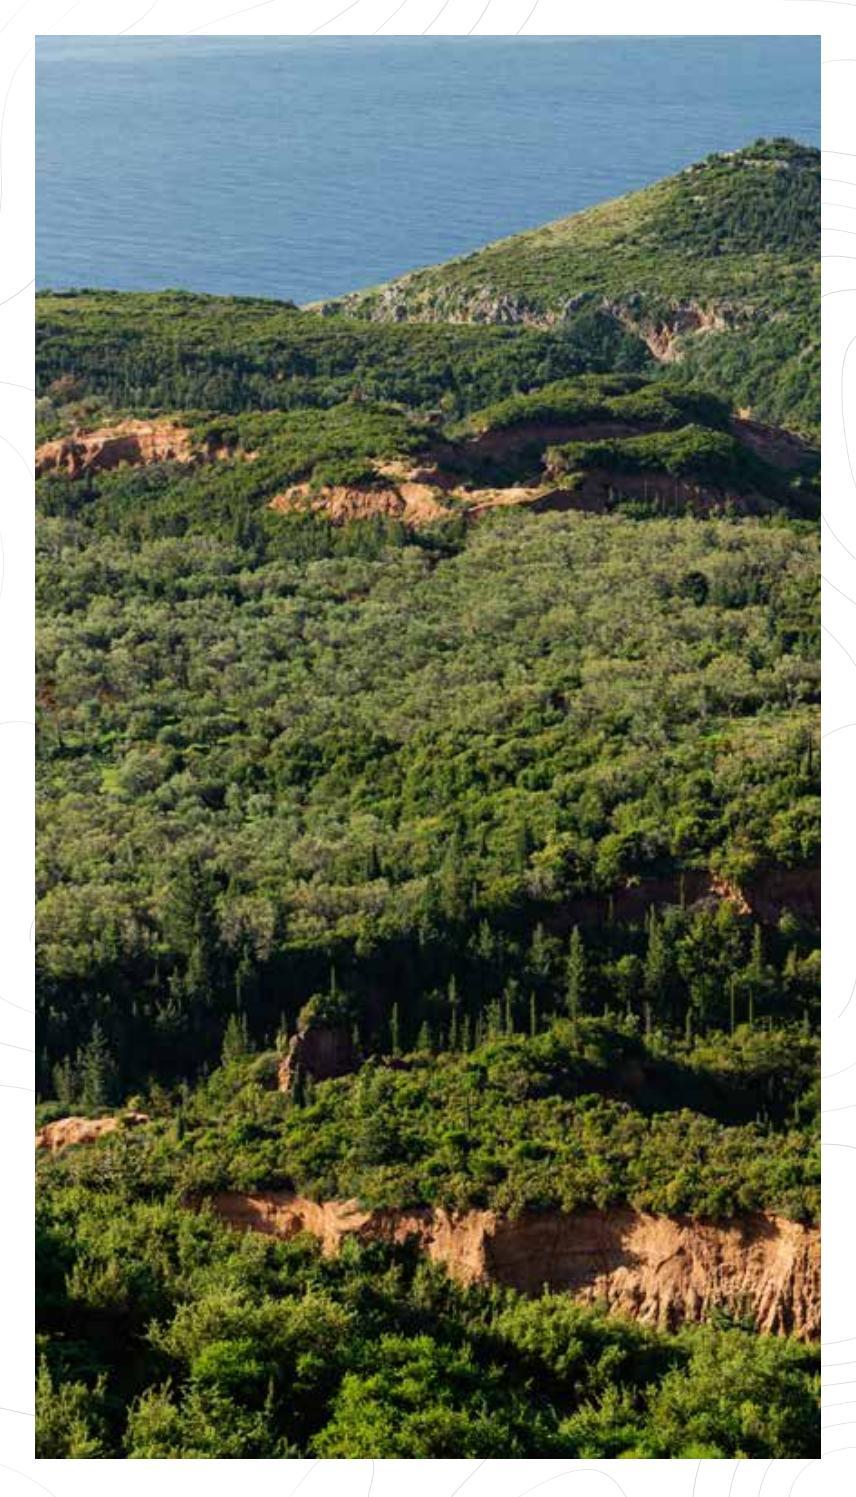 Hiking Trails in Himara Region page 2